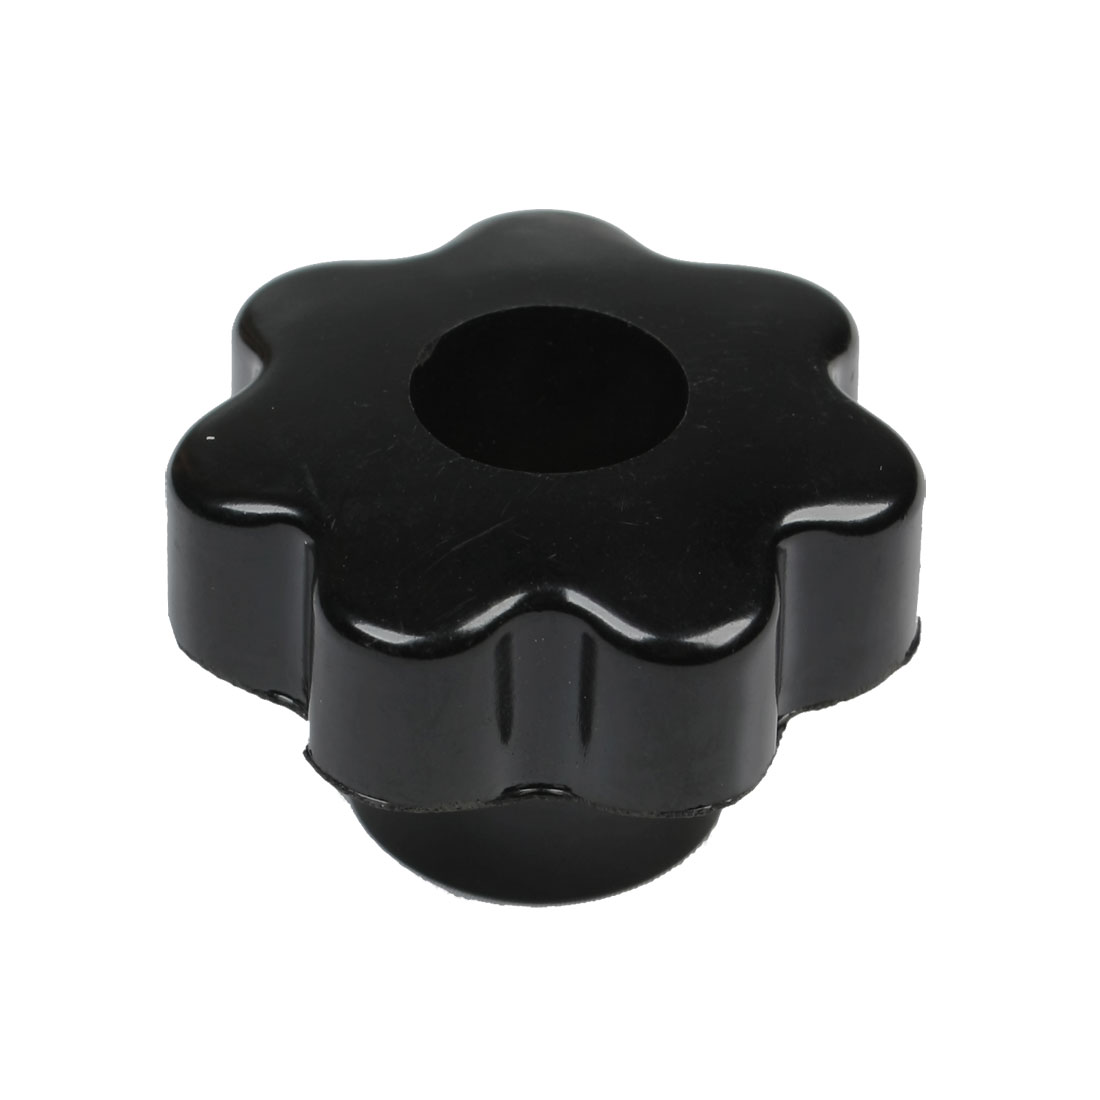 Black Gold Tone M10 50mm Diameter Through Hole Star Head Clamping Knob